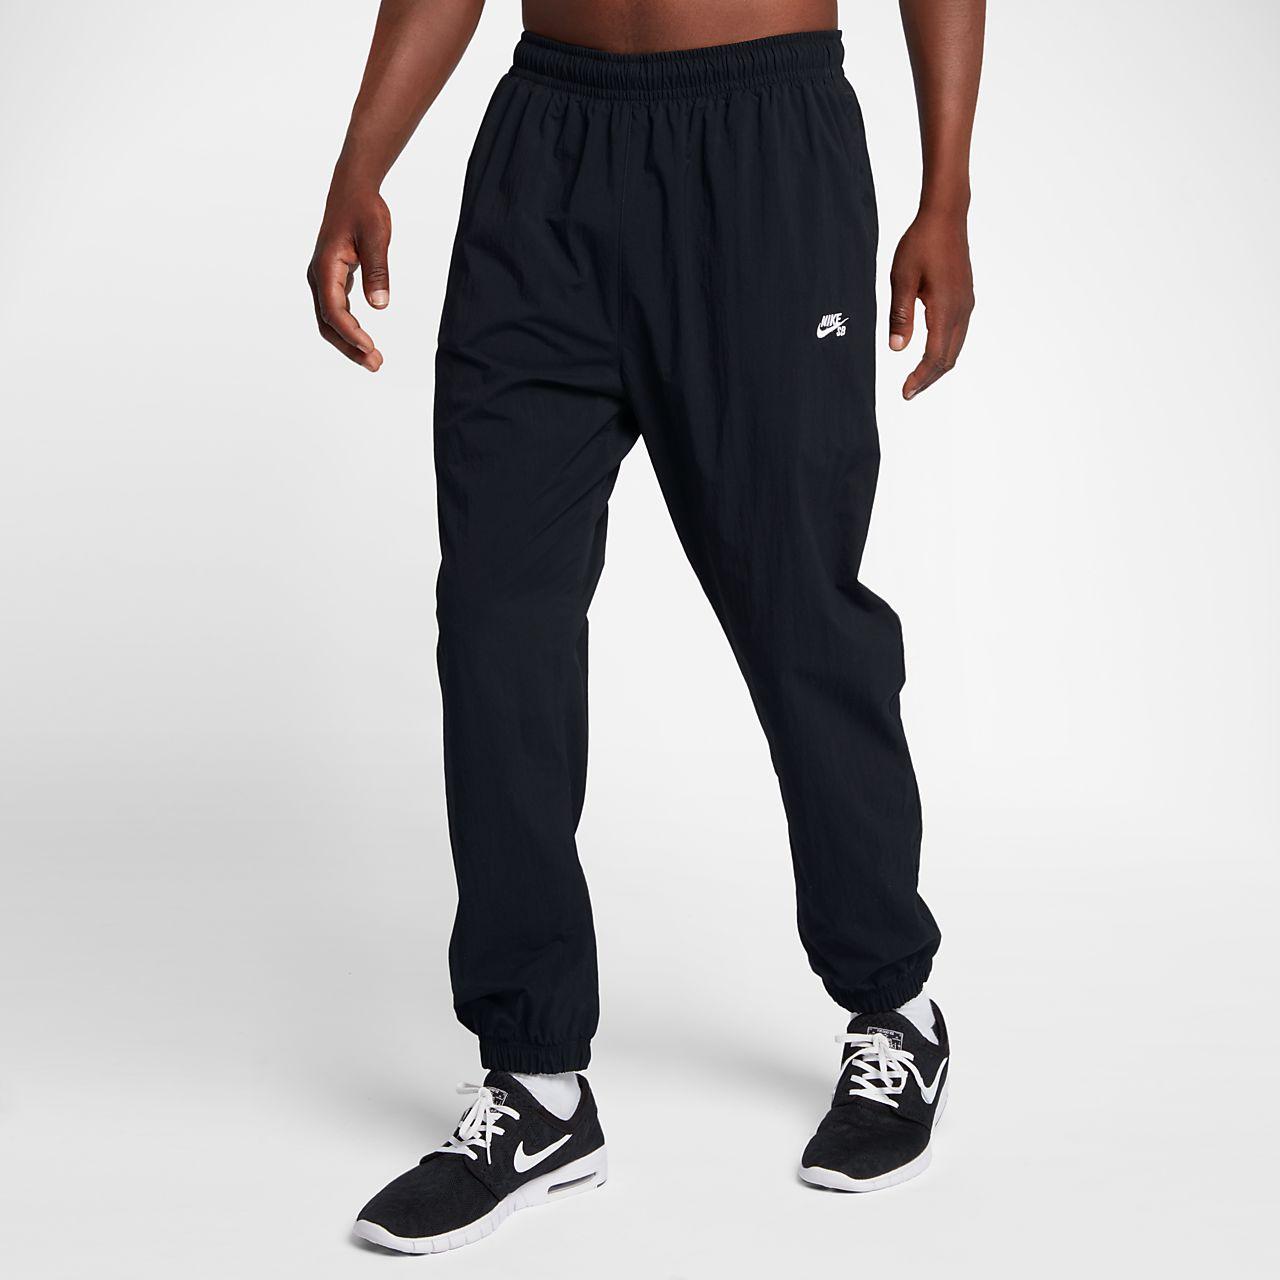 7e58cdef5dce Nike SB Flex Men s Woven Trousers. Nike.com IE